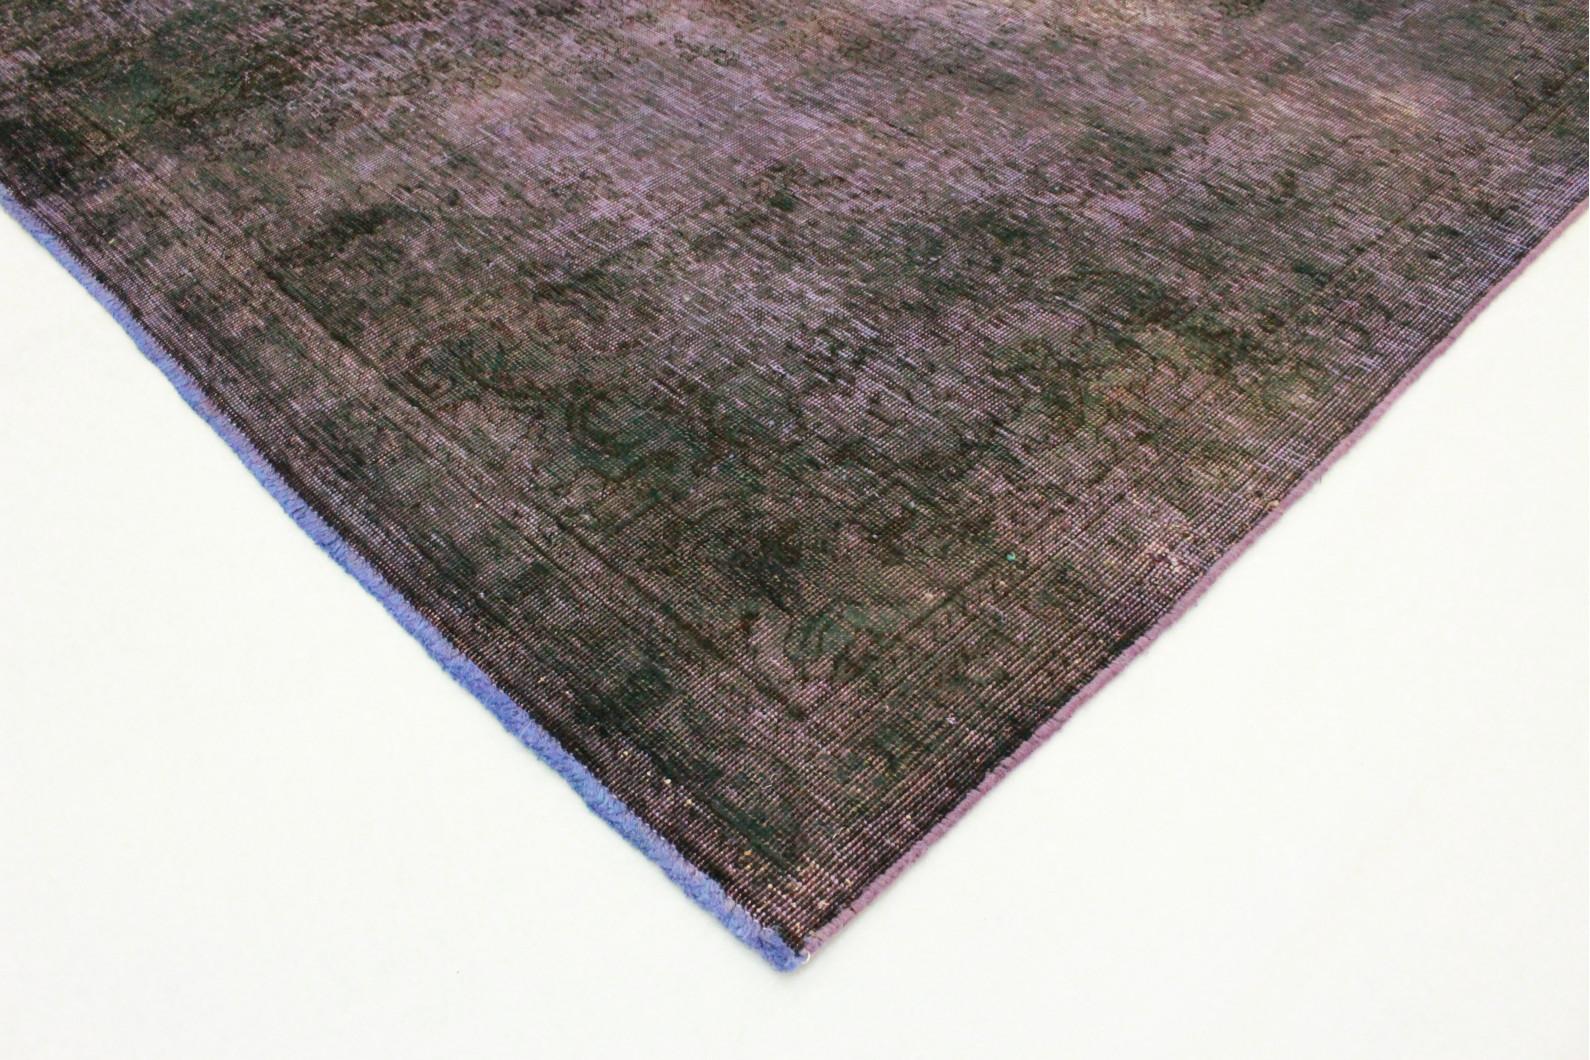 vintage teppich lila oliv in 230x230 1001 3504 bei kaufen. Black Bedroom Furniture Sets. Home Design Ideas